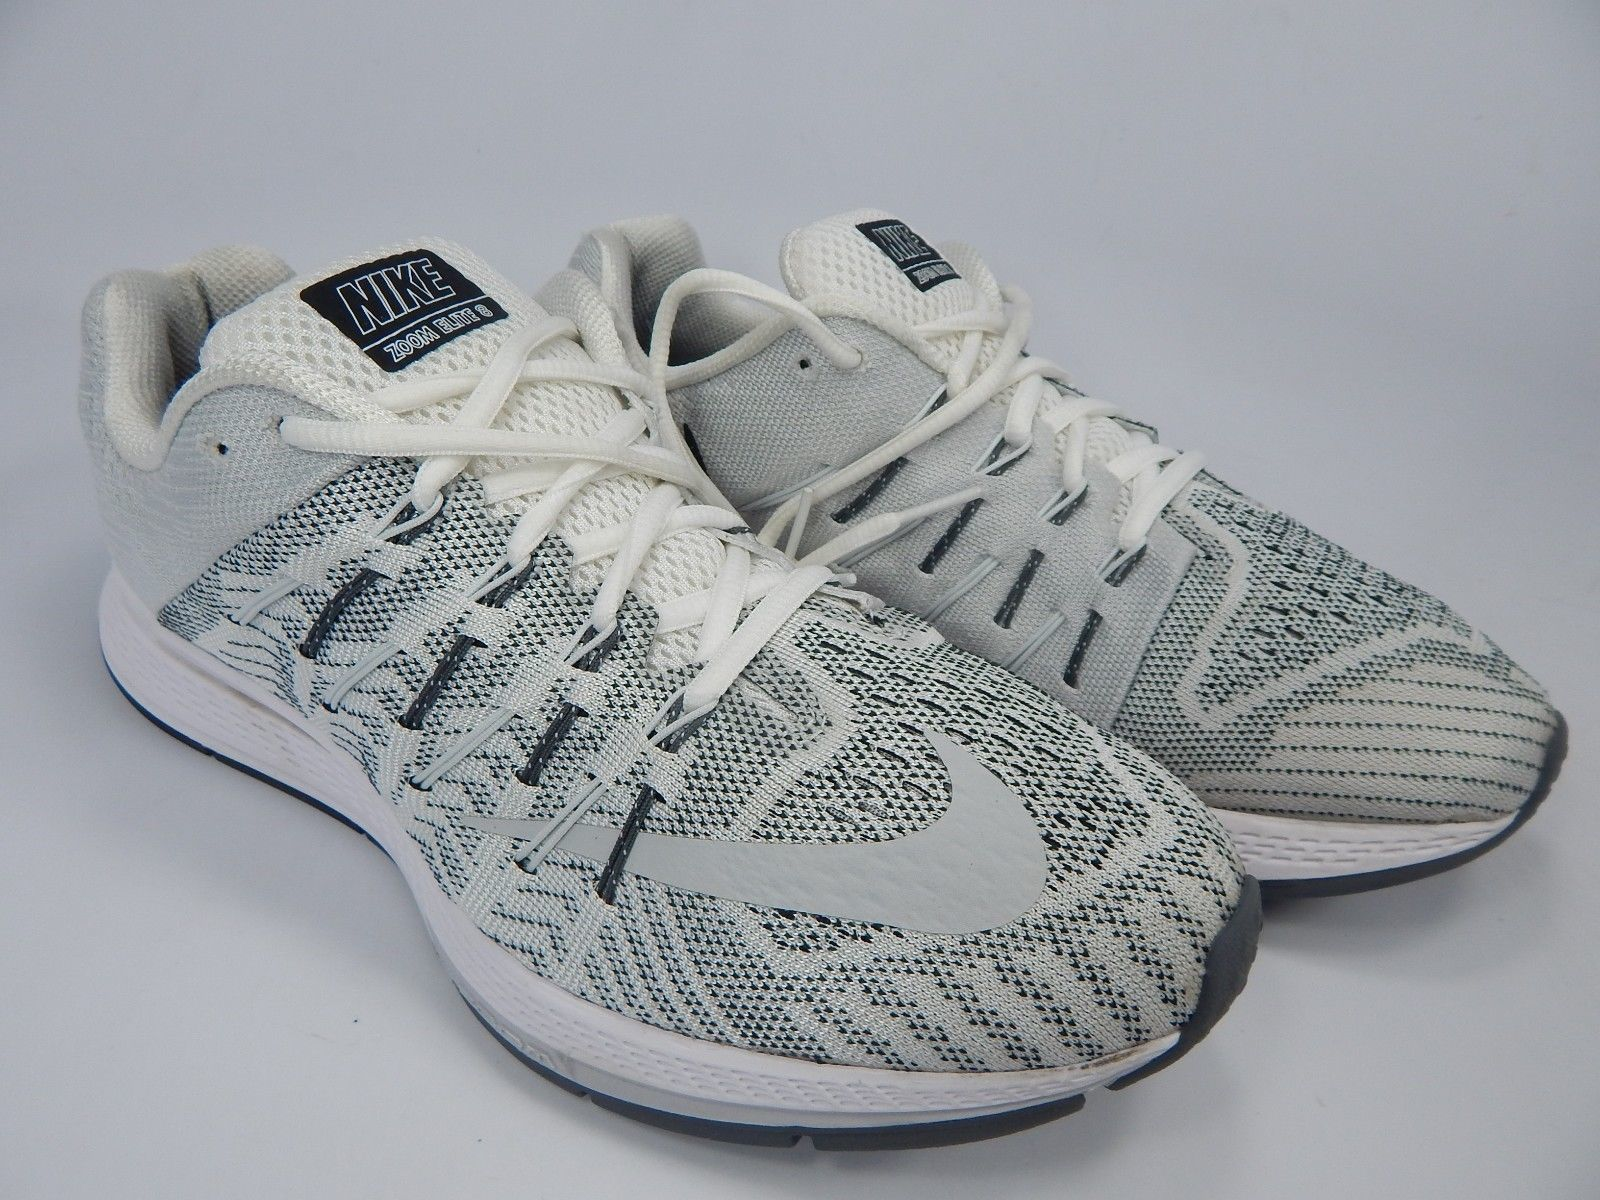 3552da31e05 Nike Air Zoom Elite 8 Size US 11 M (B) EU 43 and 11 similar items